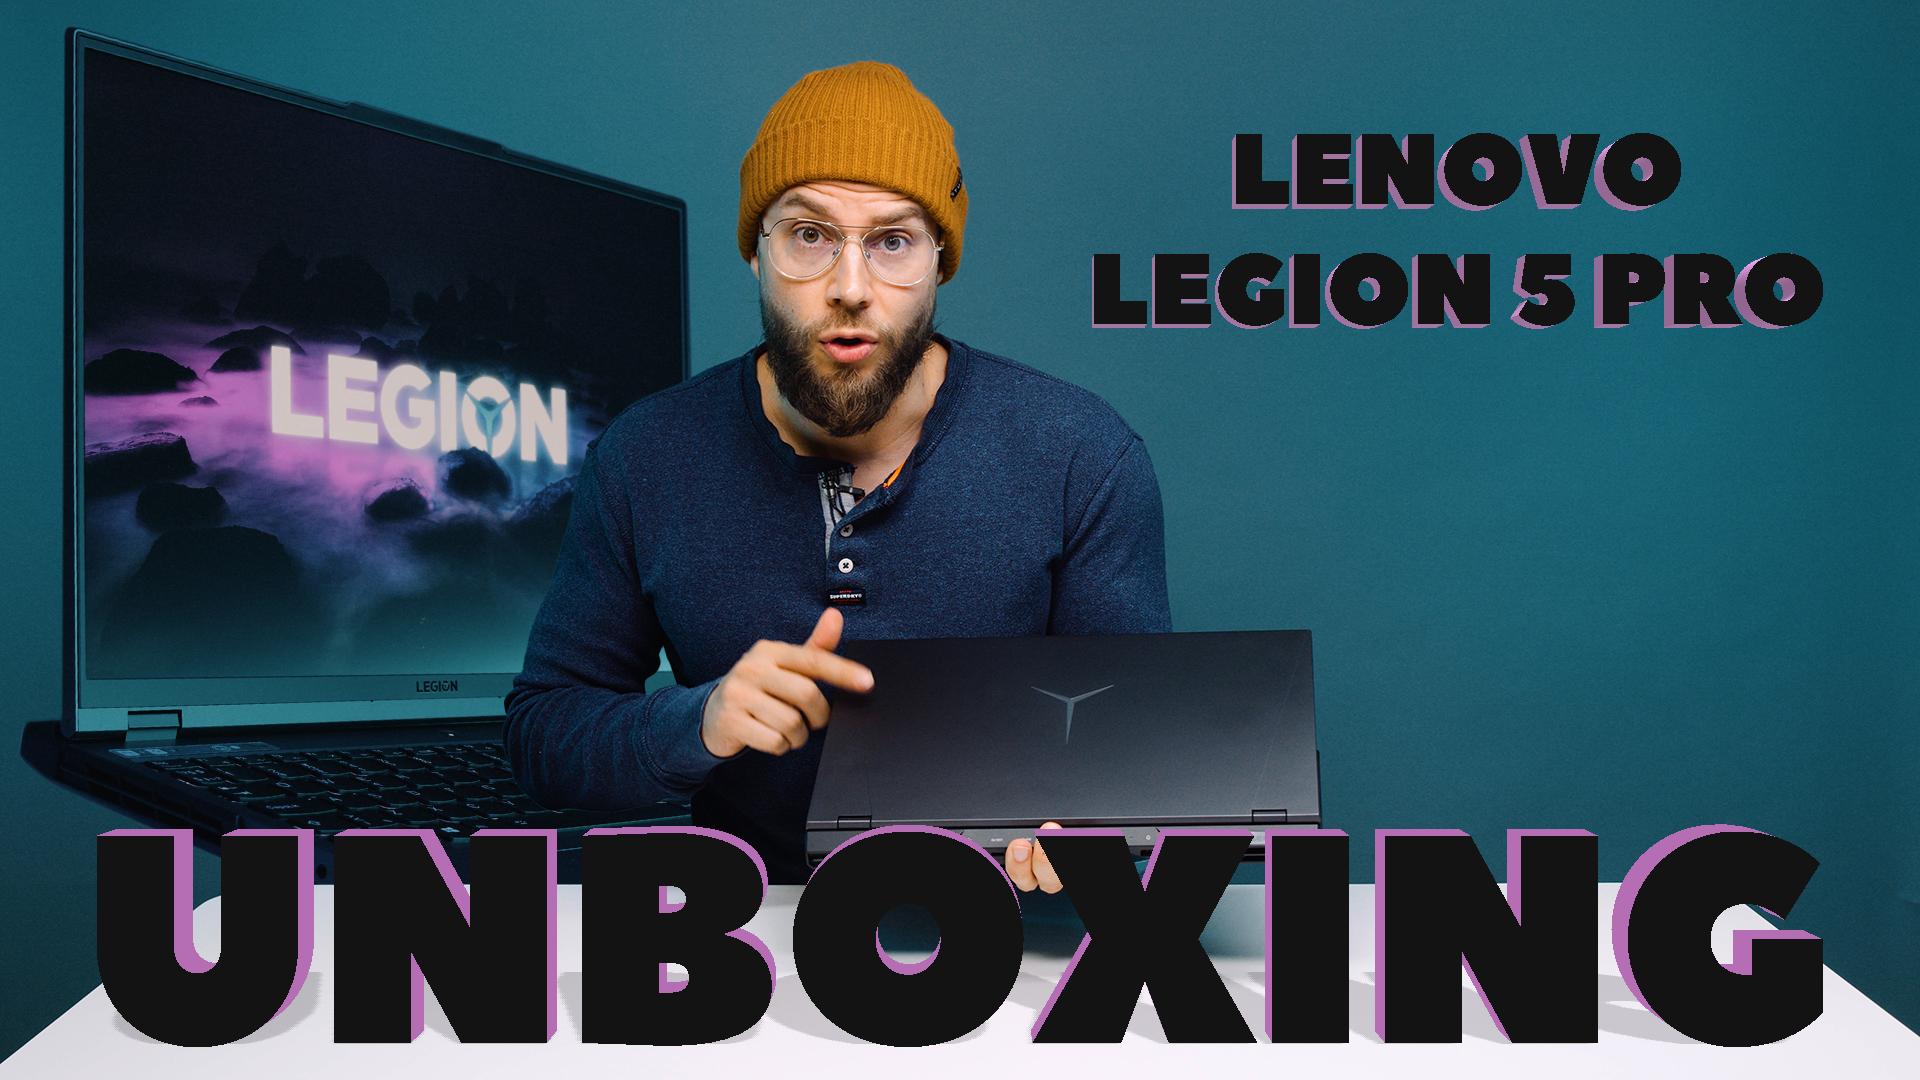 Lenovo Legion 5 Pro UNBOXING